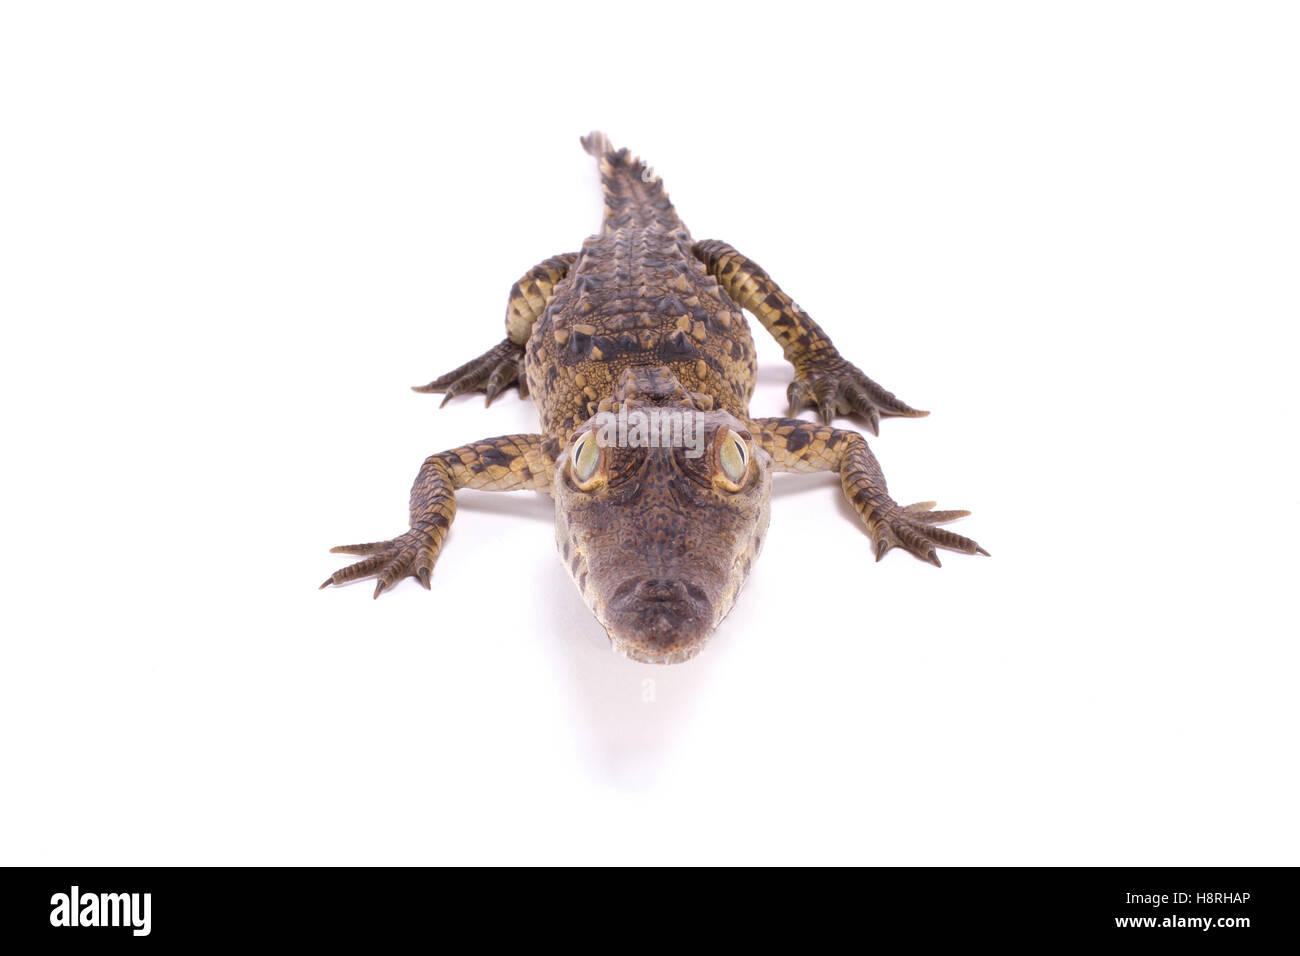 American crocodile ,Crocodylus acutus - Stock Image